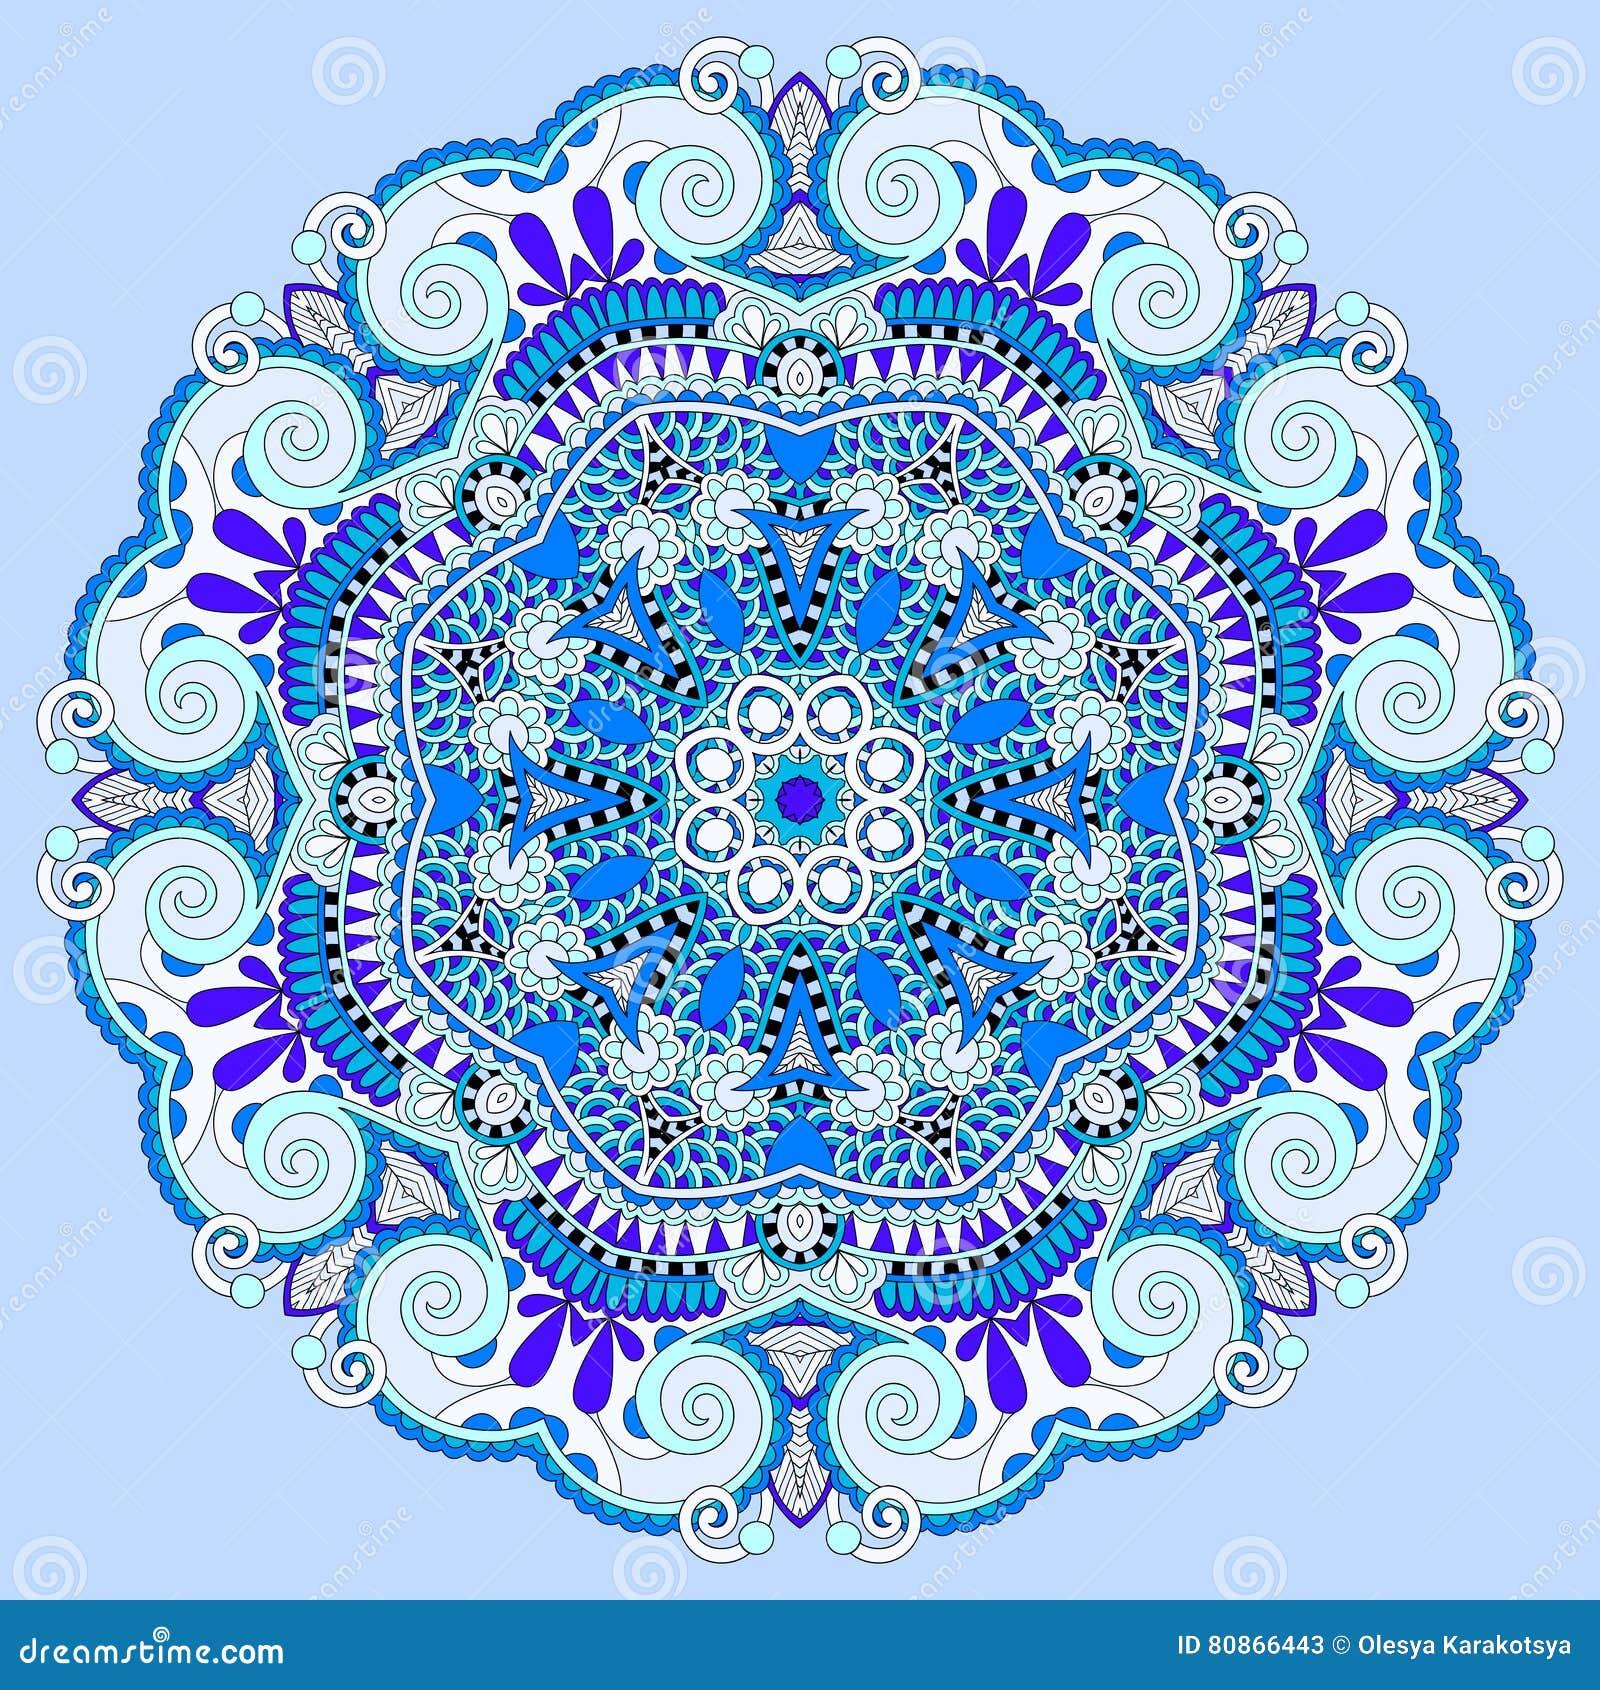 Mandala blue circle decorative spiritual indian symbol of lotus download mandala blue circle decorative spiritual indian symbol of lotus stock vector illustration of mightylinksfo